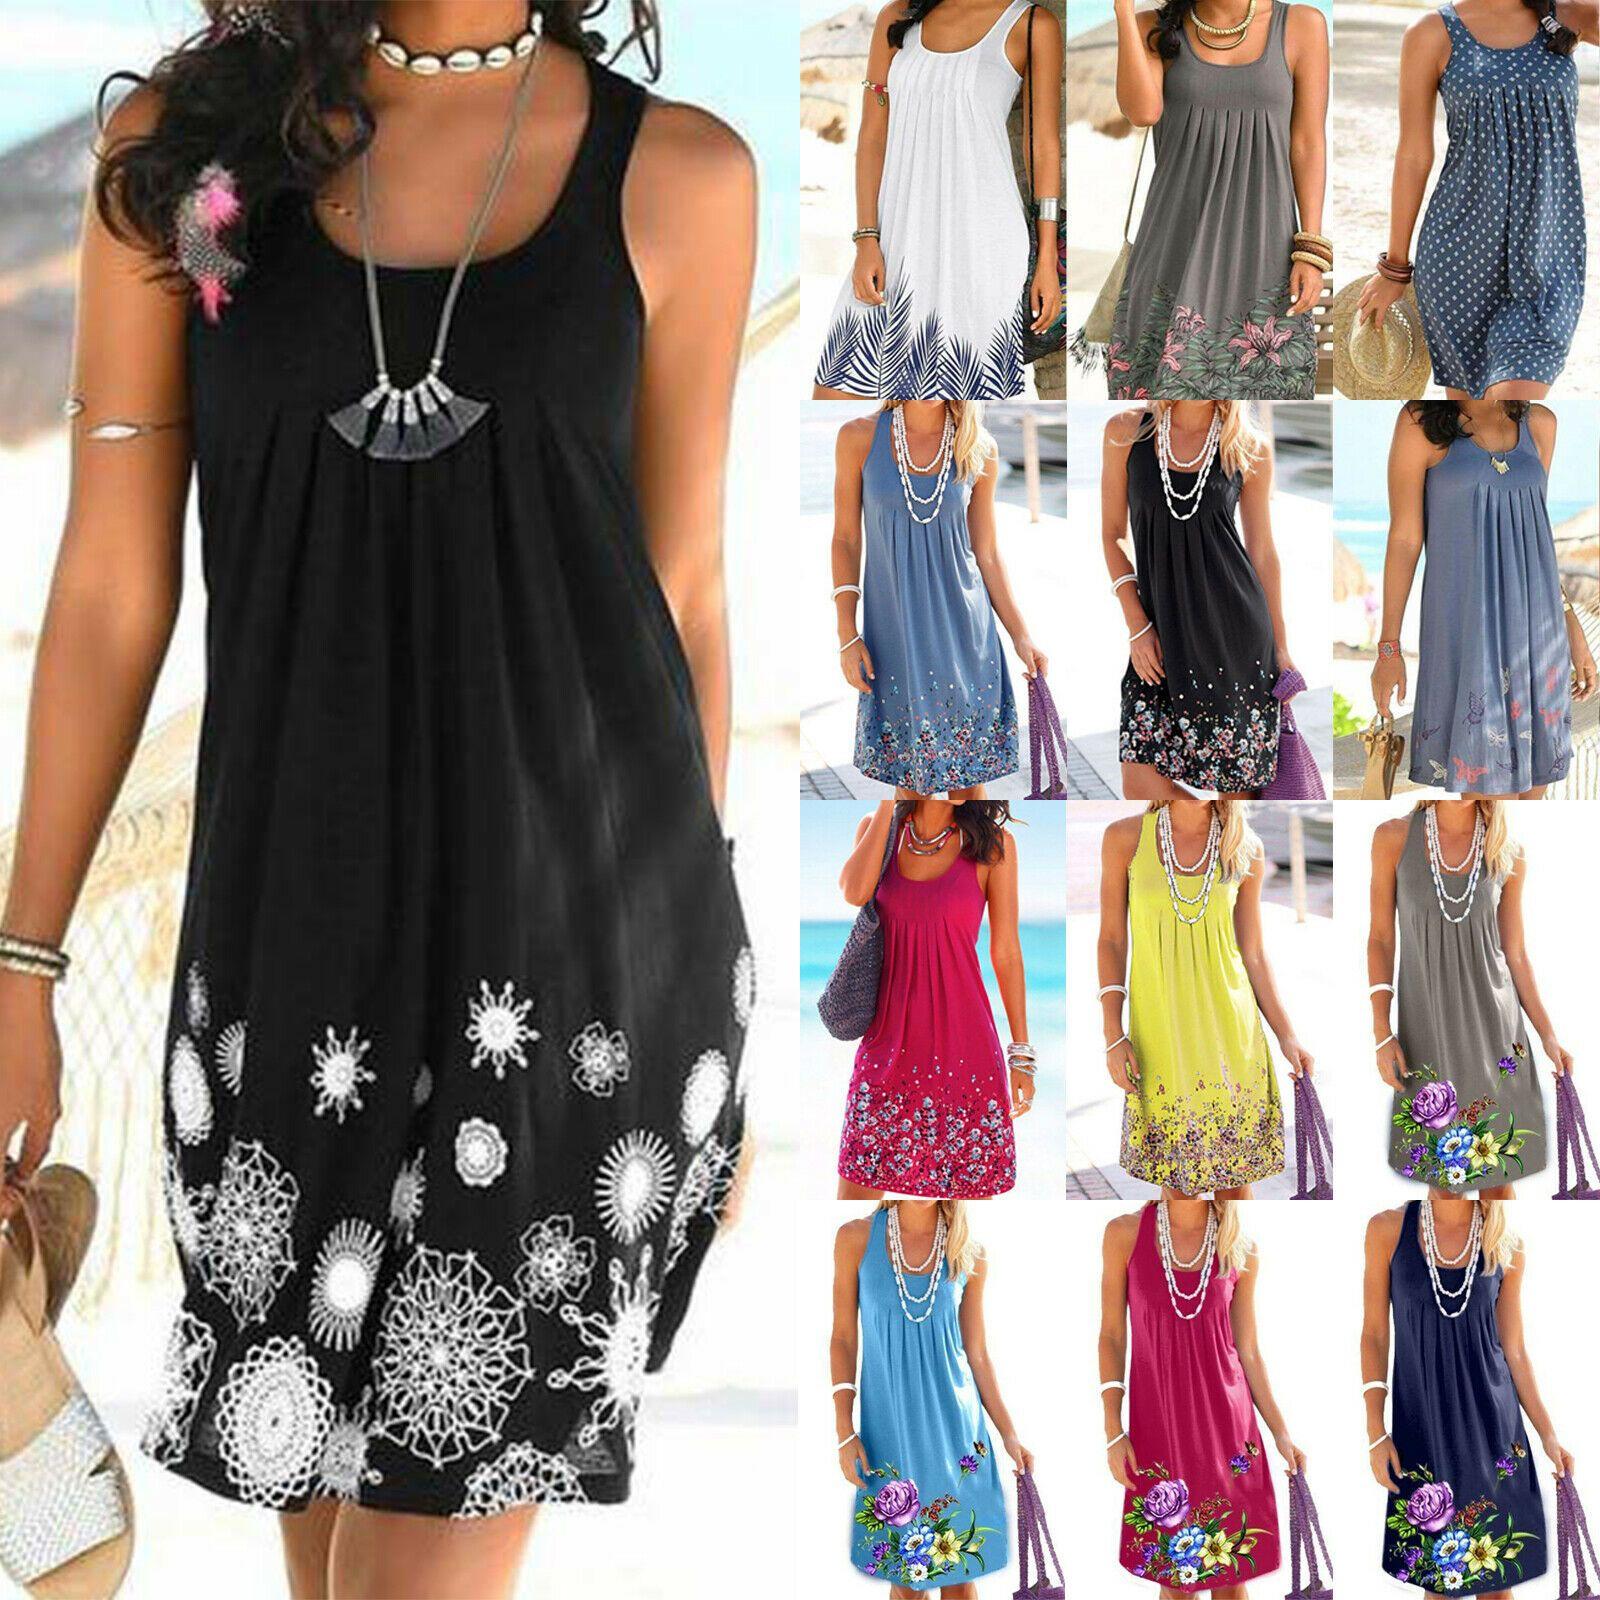 Damen Sommer Boho Kleid Strandkleid Minikleid Ärmellos Partykleid Longtop Bluse